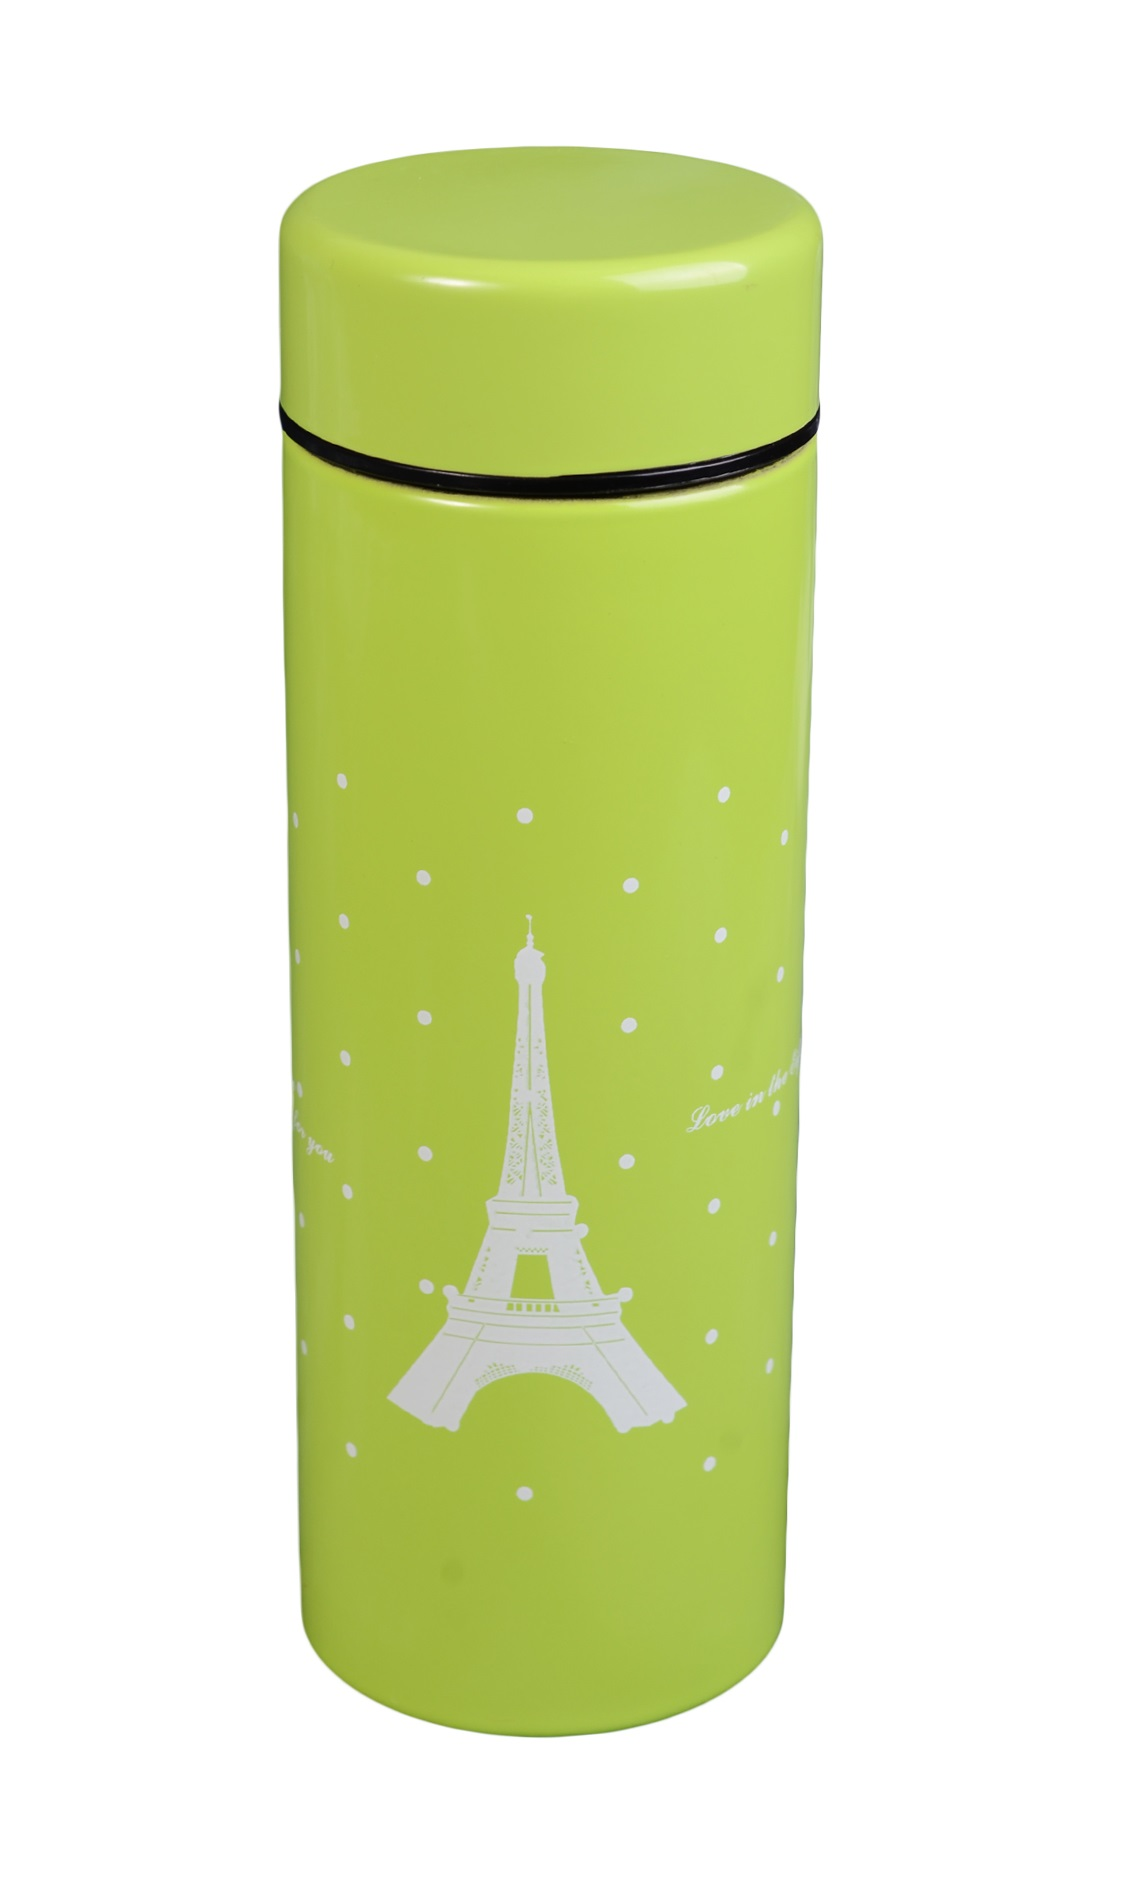 Термос Париж со звездами (180мл)